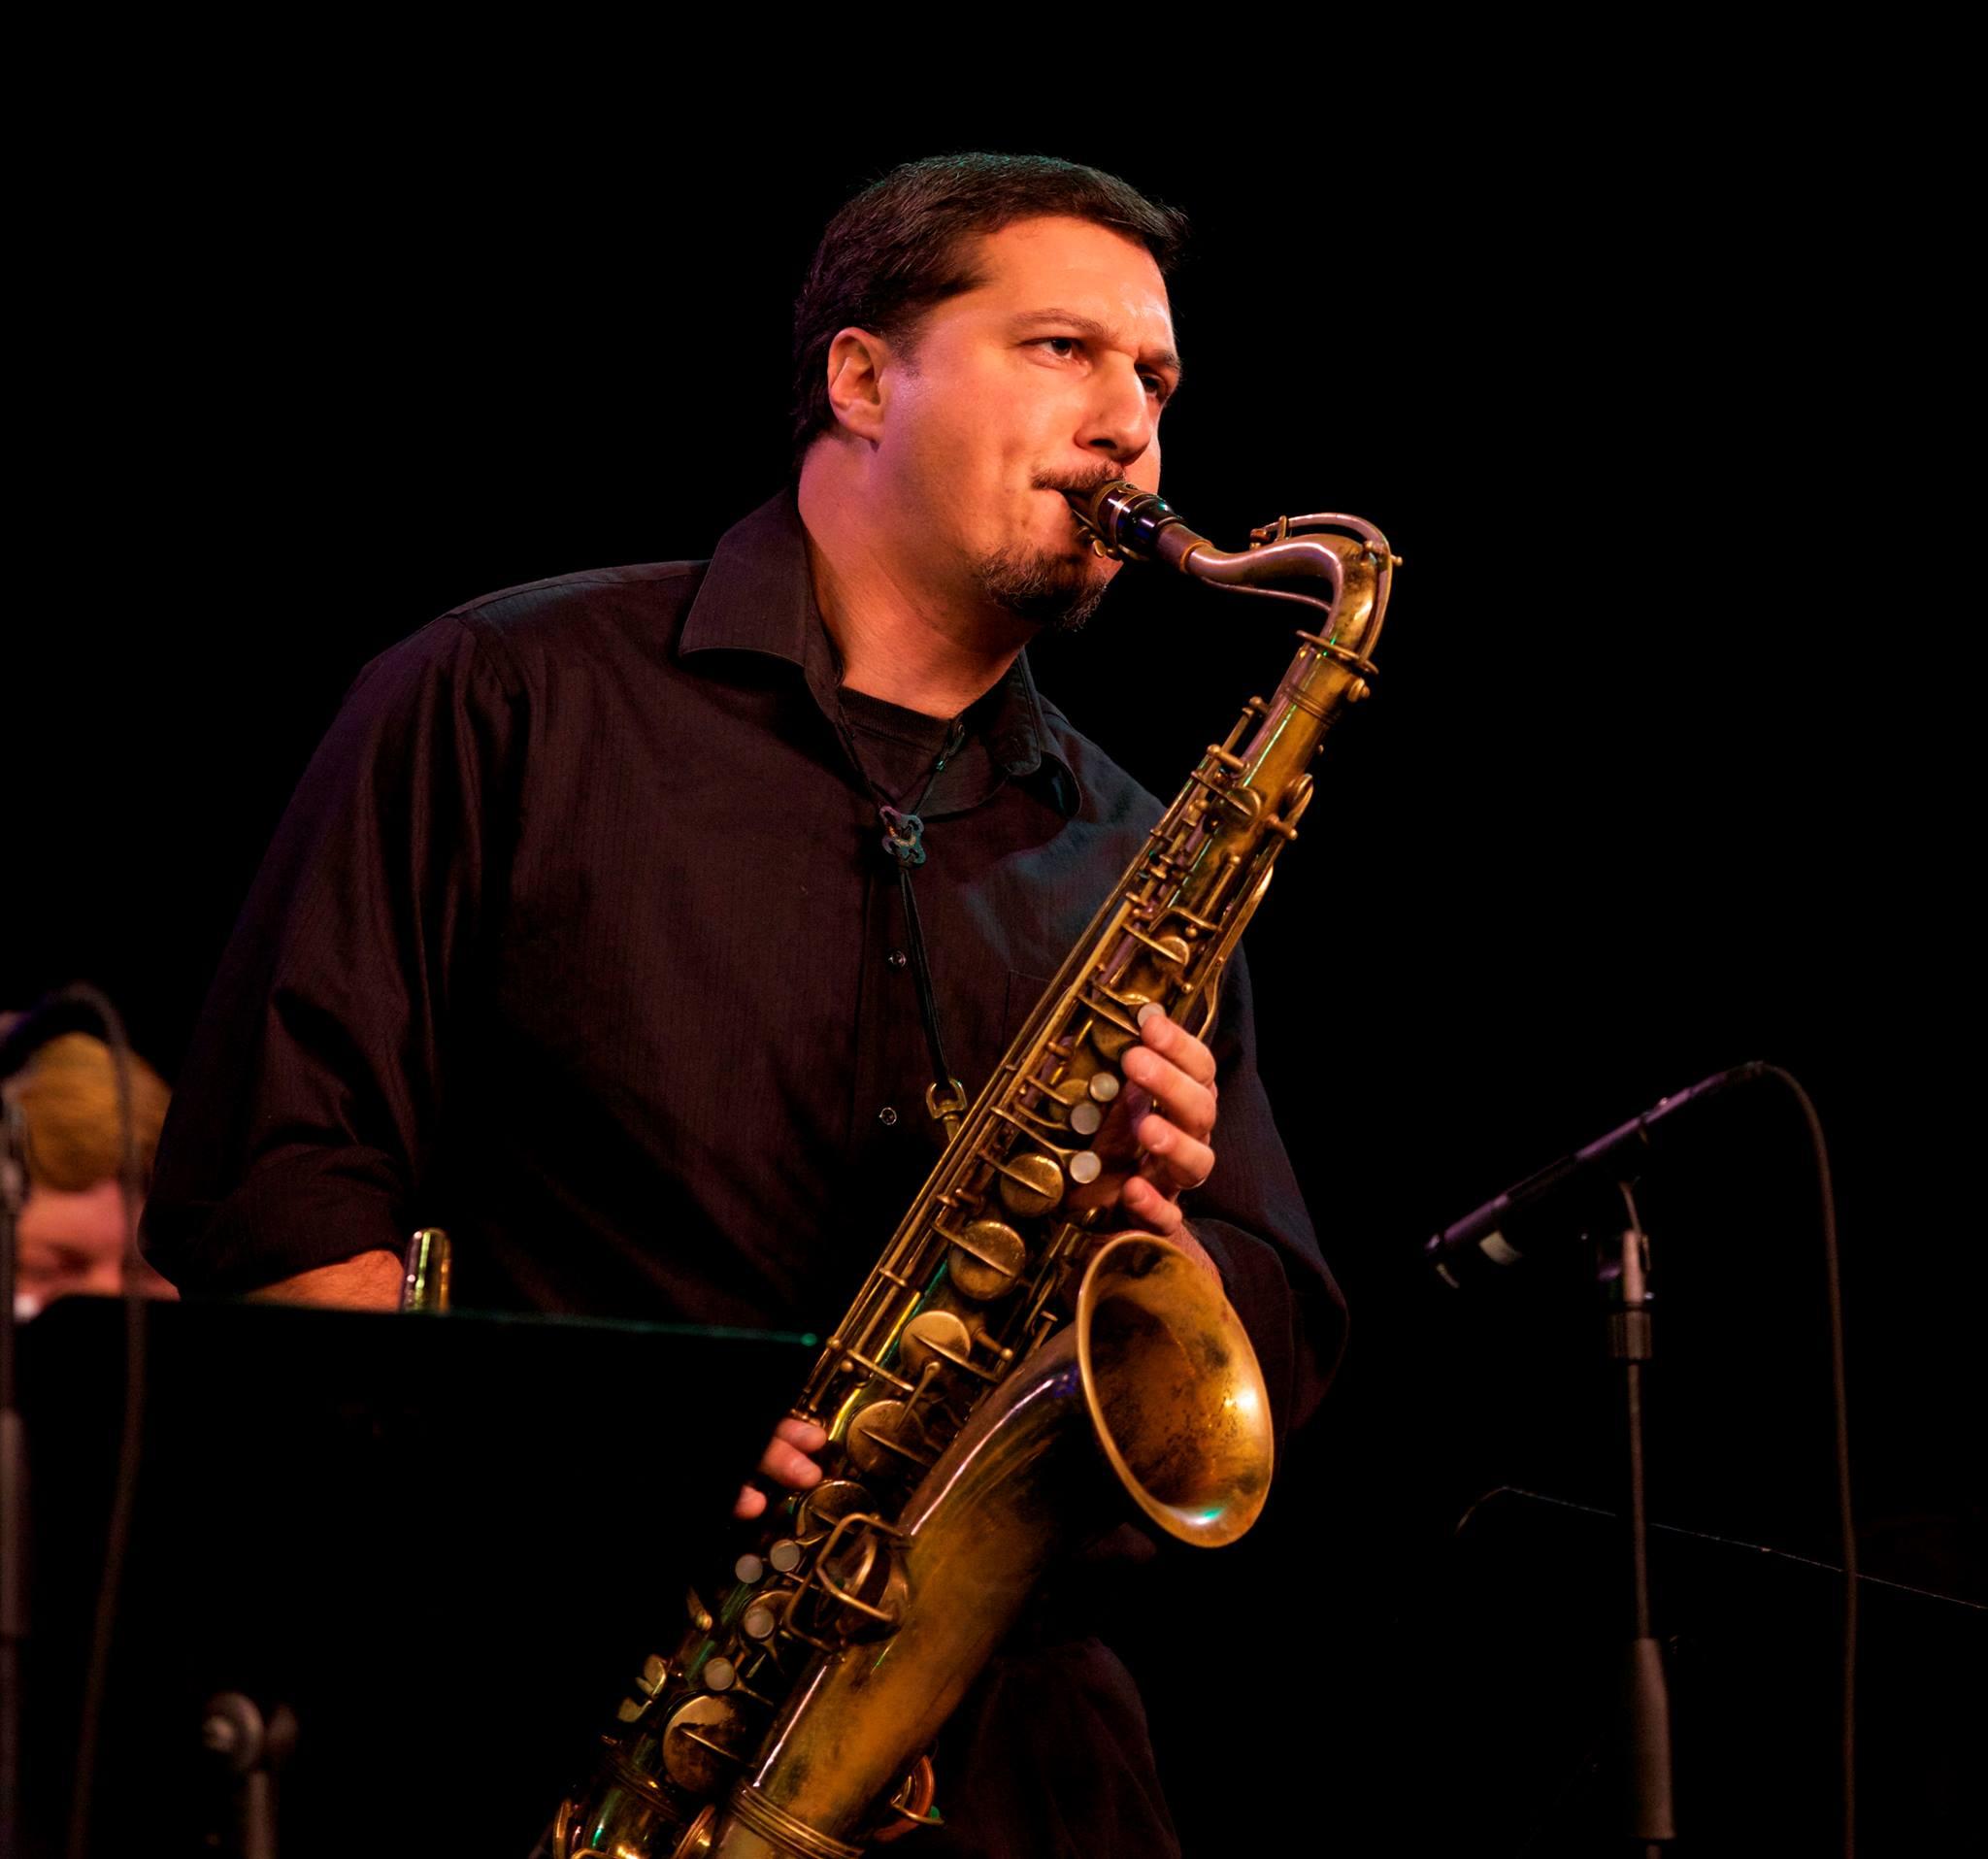 Jeffrey Stephan ,Director of Bands at La Mesa Junior High School in La Mesa, California